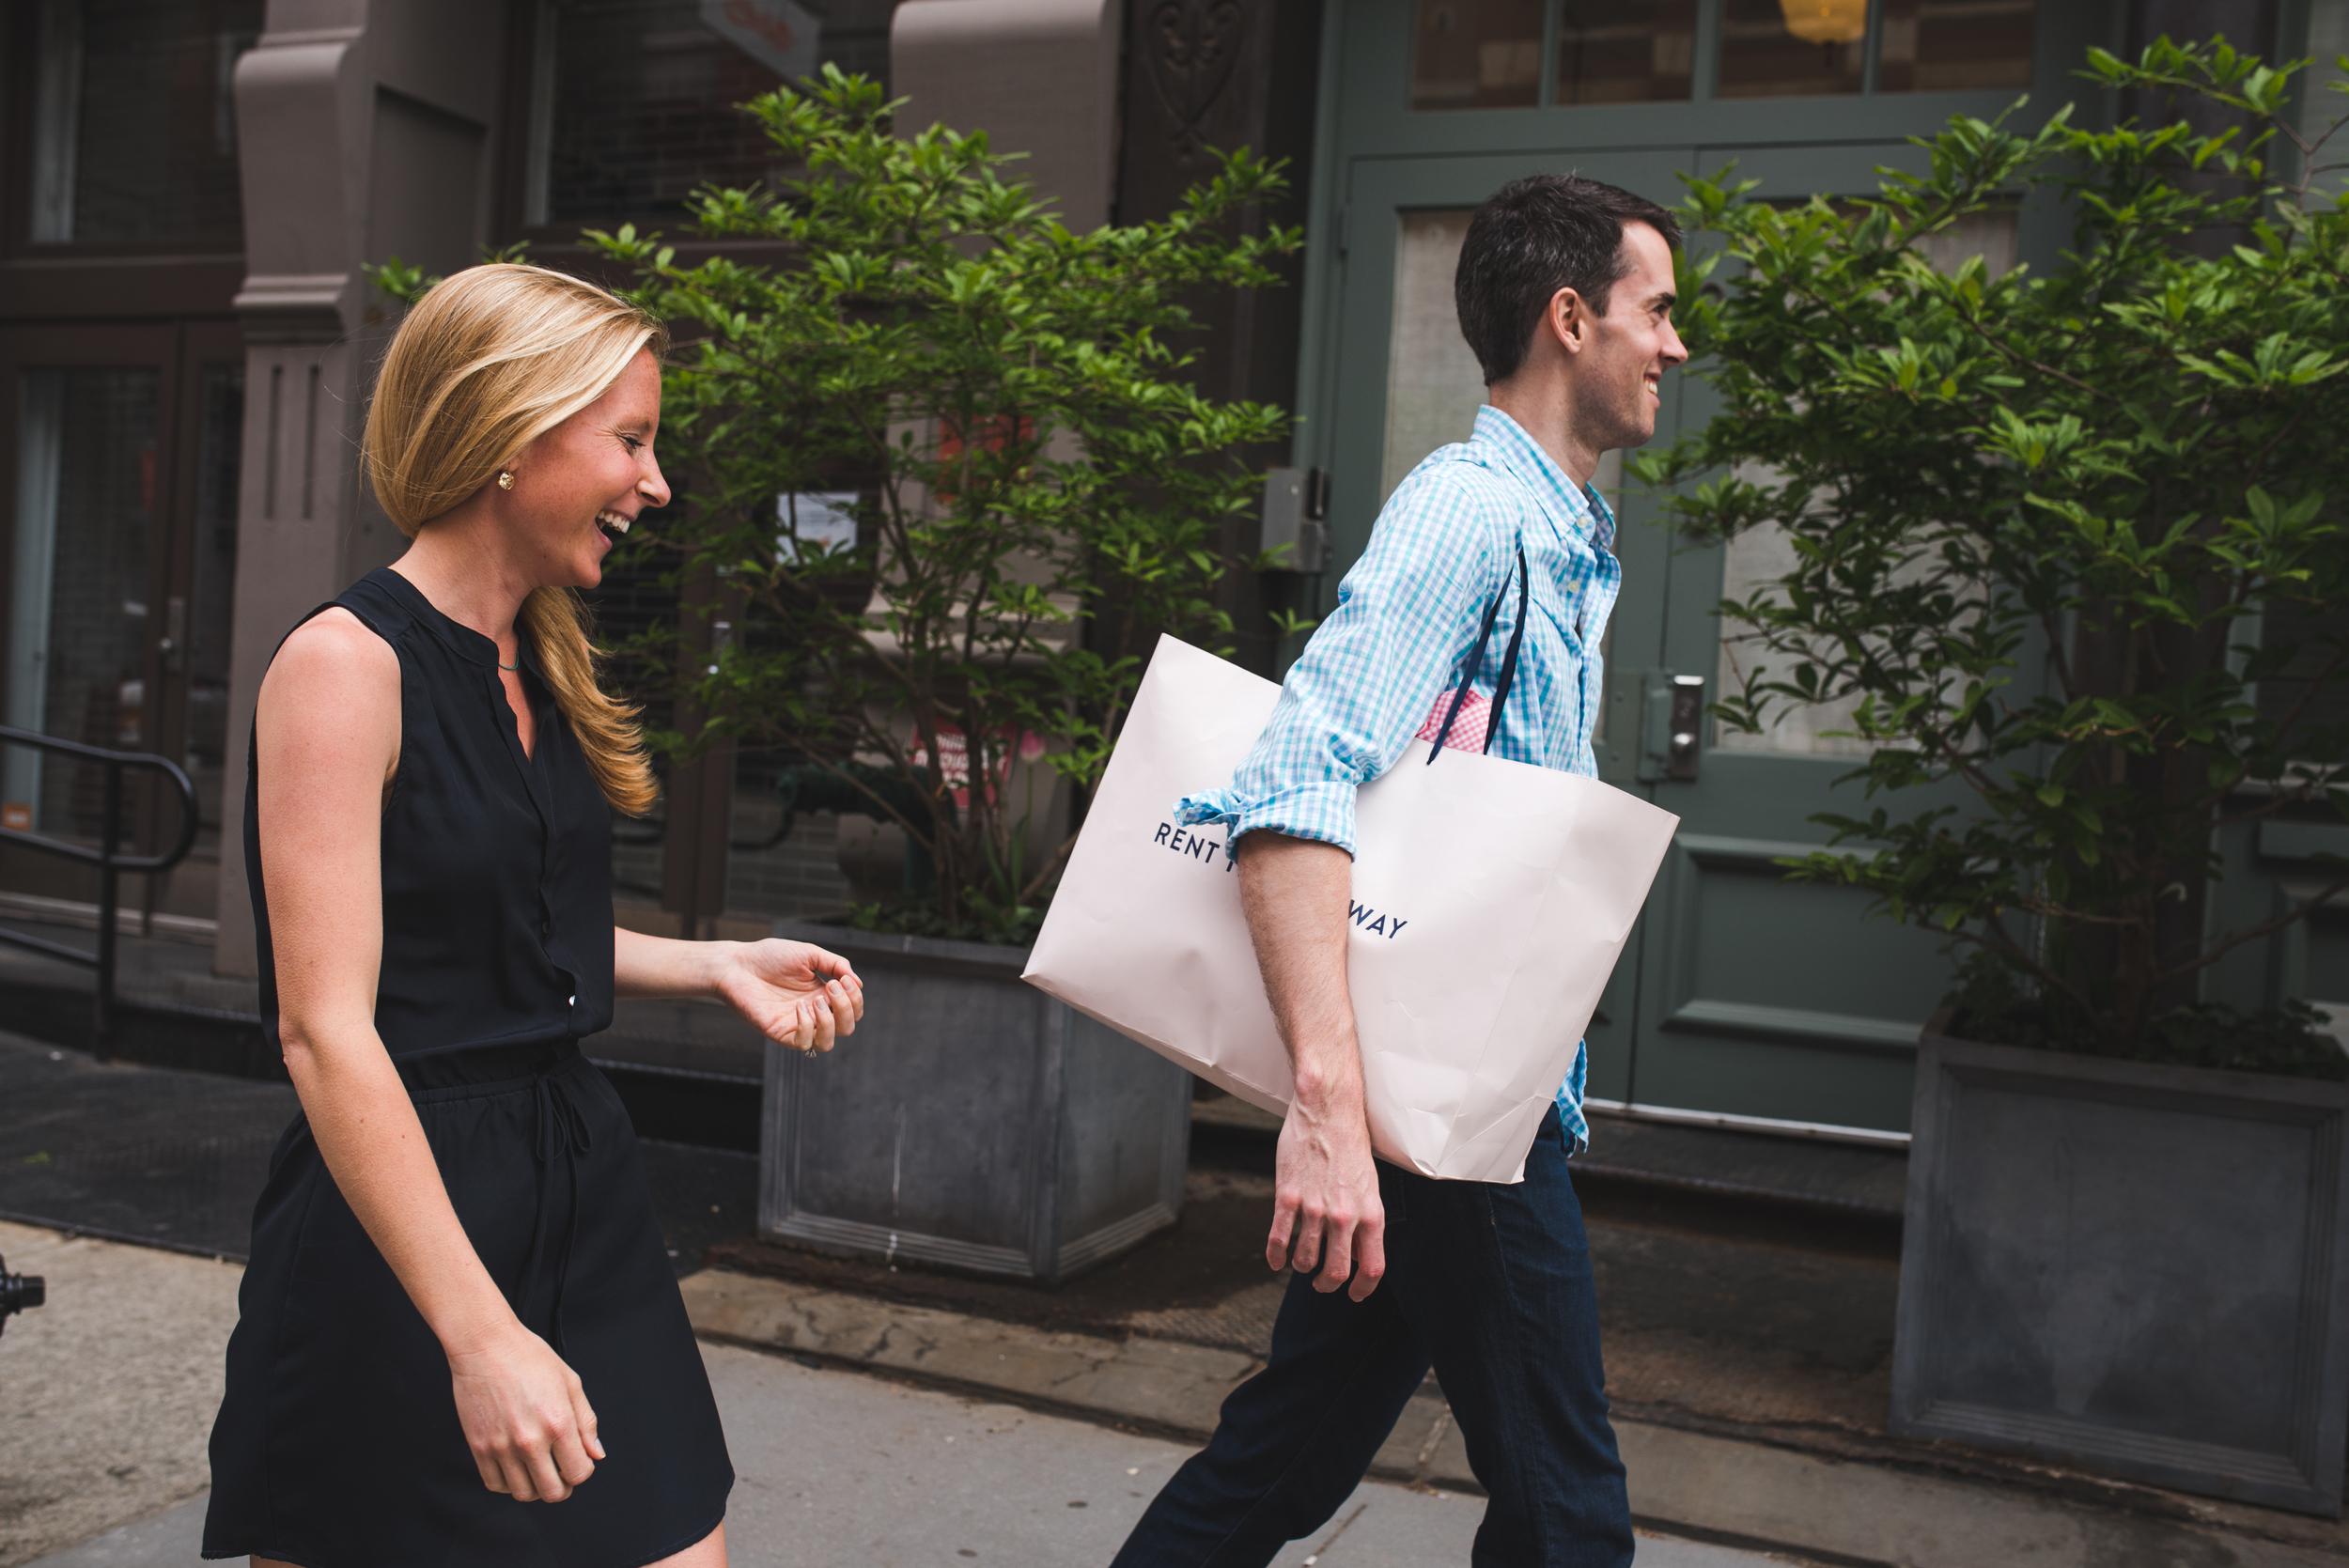 Feature husband caring her wife bag.JPG